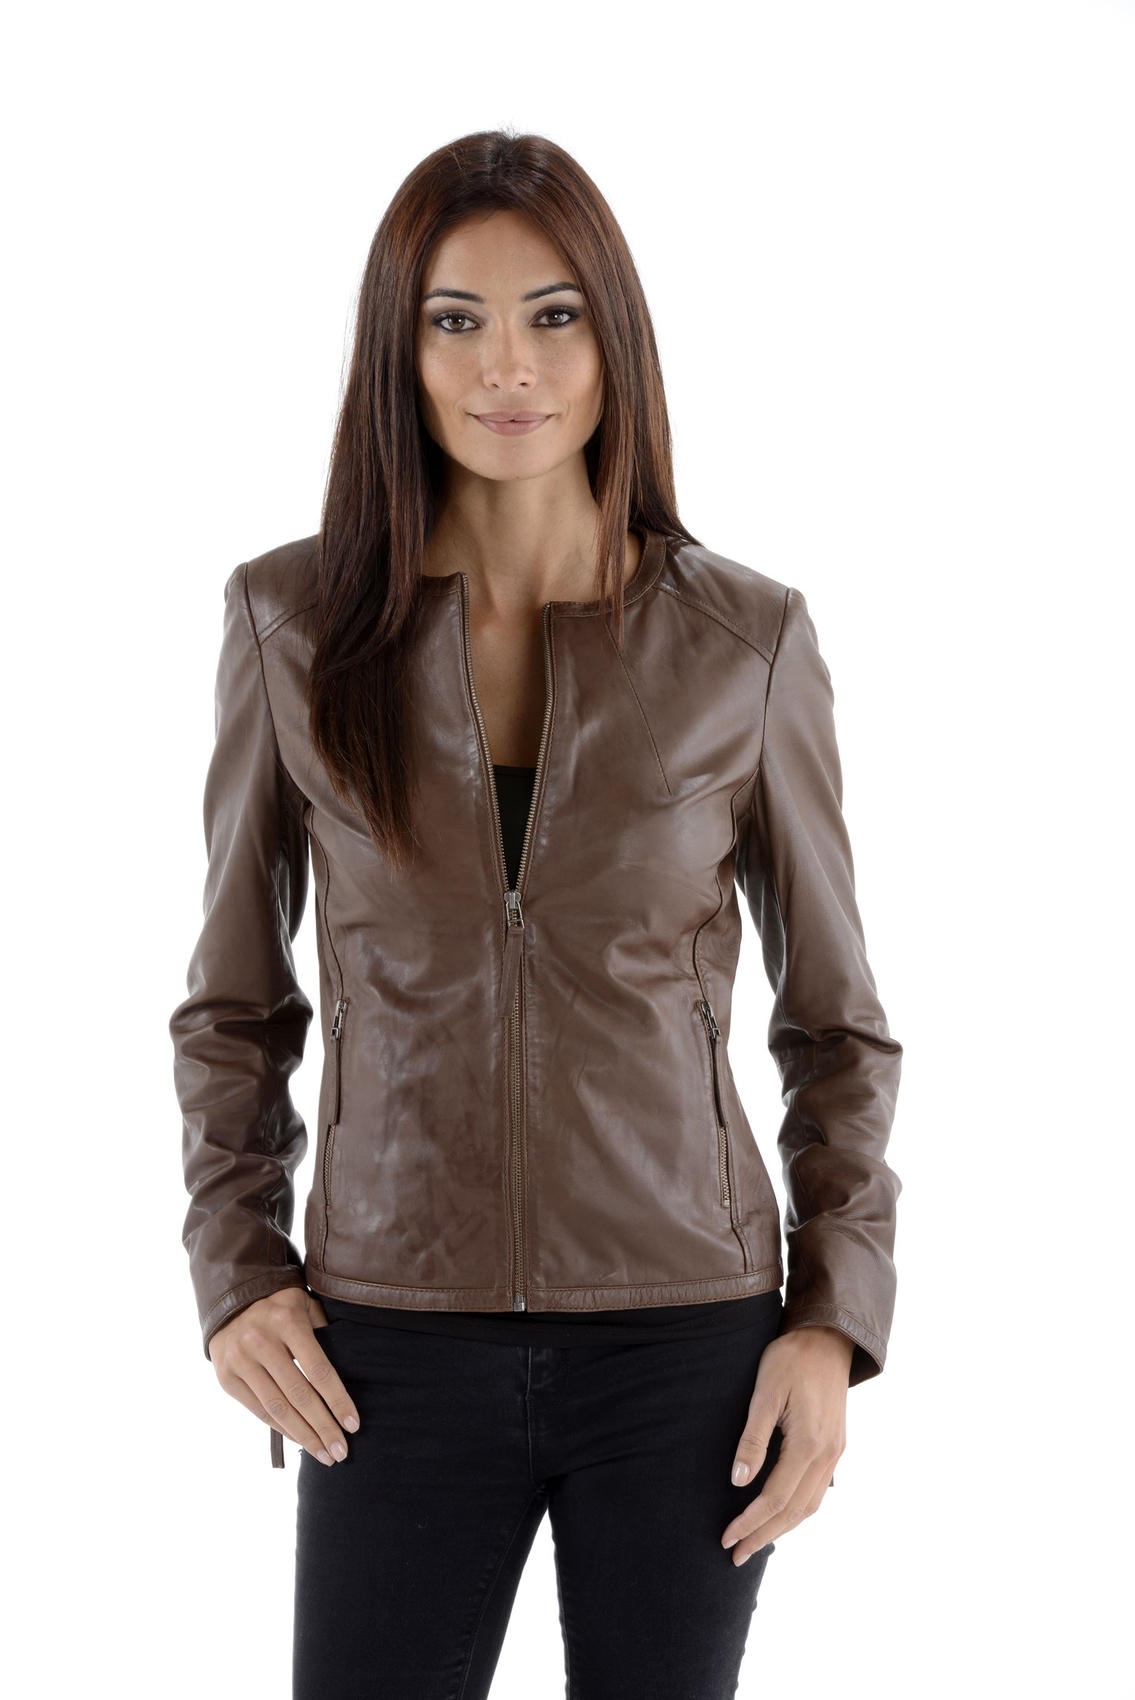 spencer cuir vestes blazer cuirs guignard en cuir agneau ref 17900 yag16 noir. Black Bedroom Furniture Sets. Home Design Ideas